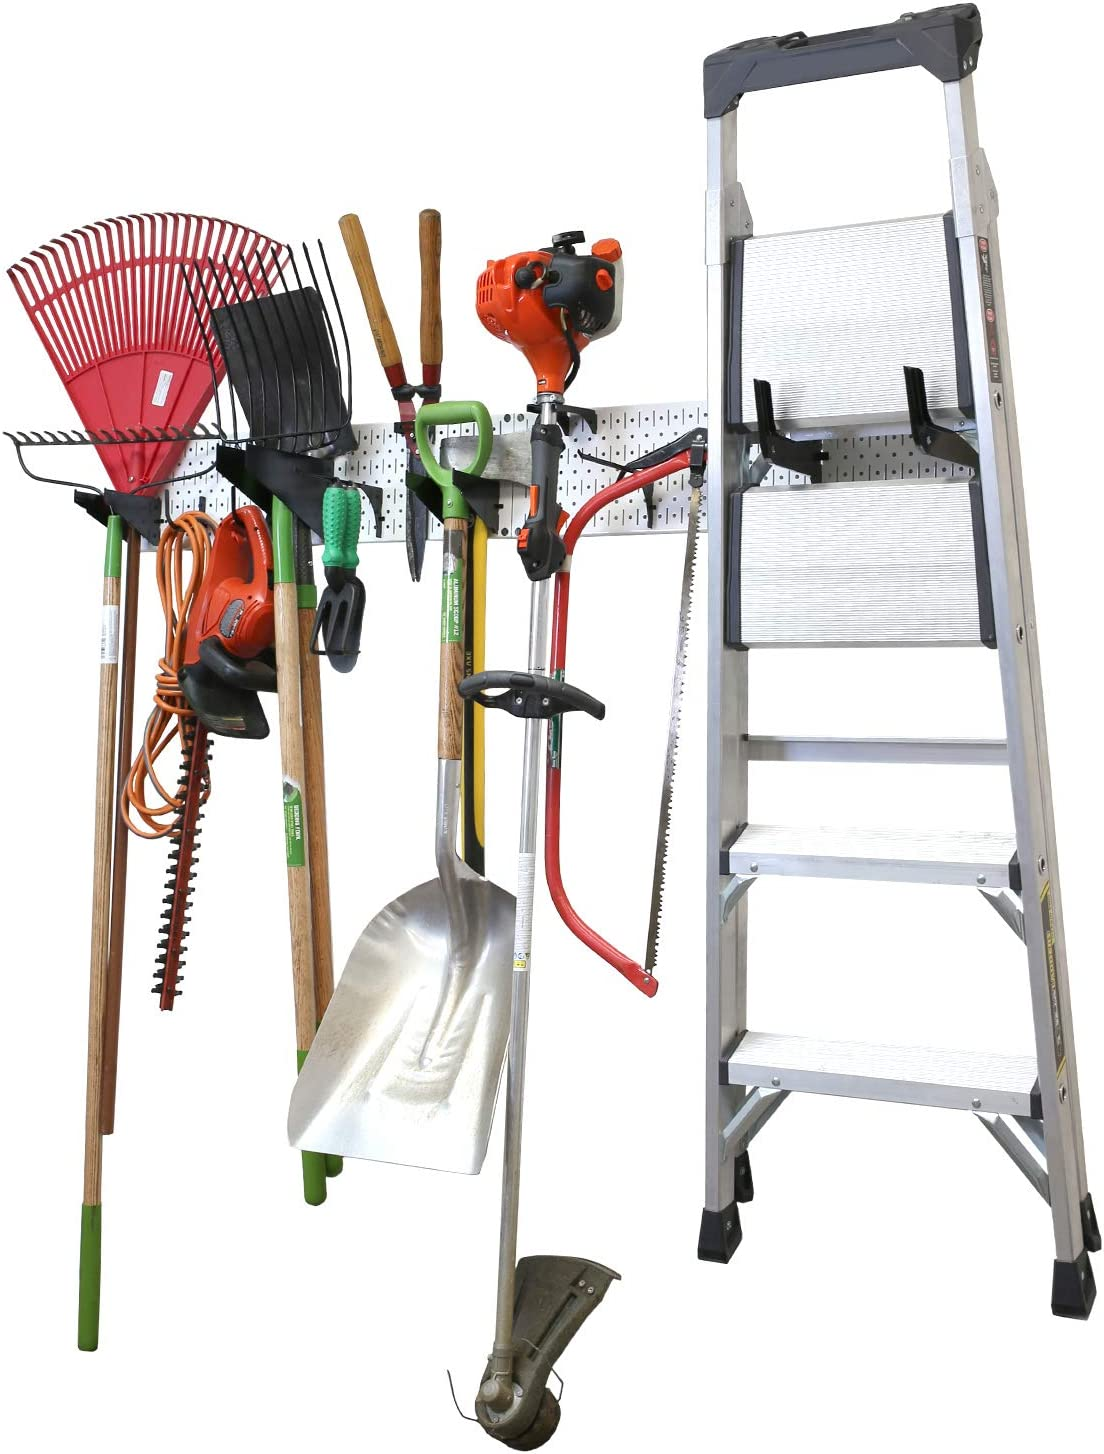 "Wall Control Garage Storage Rack Lawn & Garden Tool Organization Wall Mount Organizer - Easy to Install 64"" Wide Home & Garage Metal Peg Board Set (White Pegboard)"